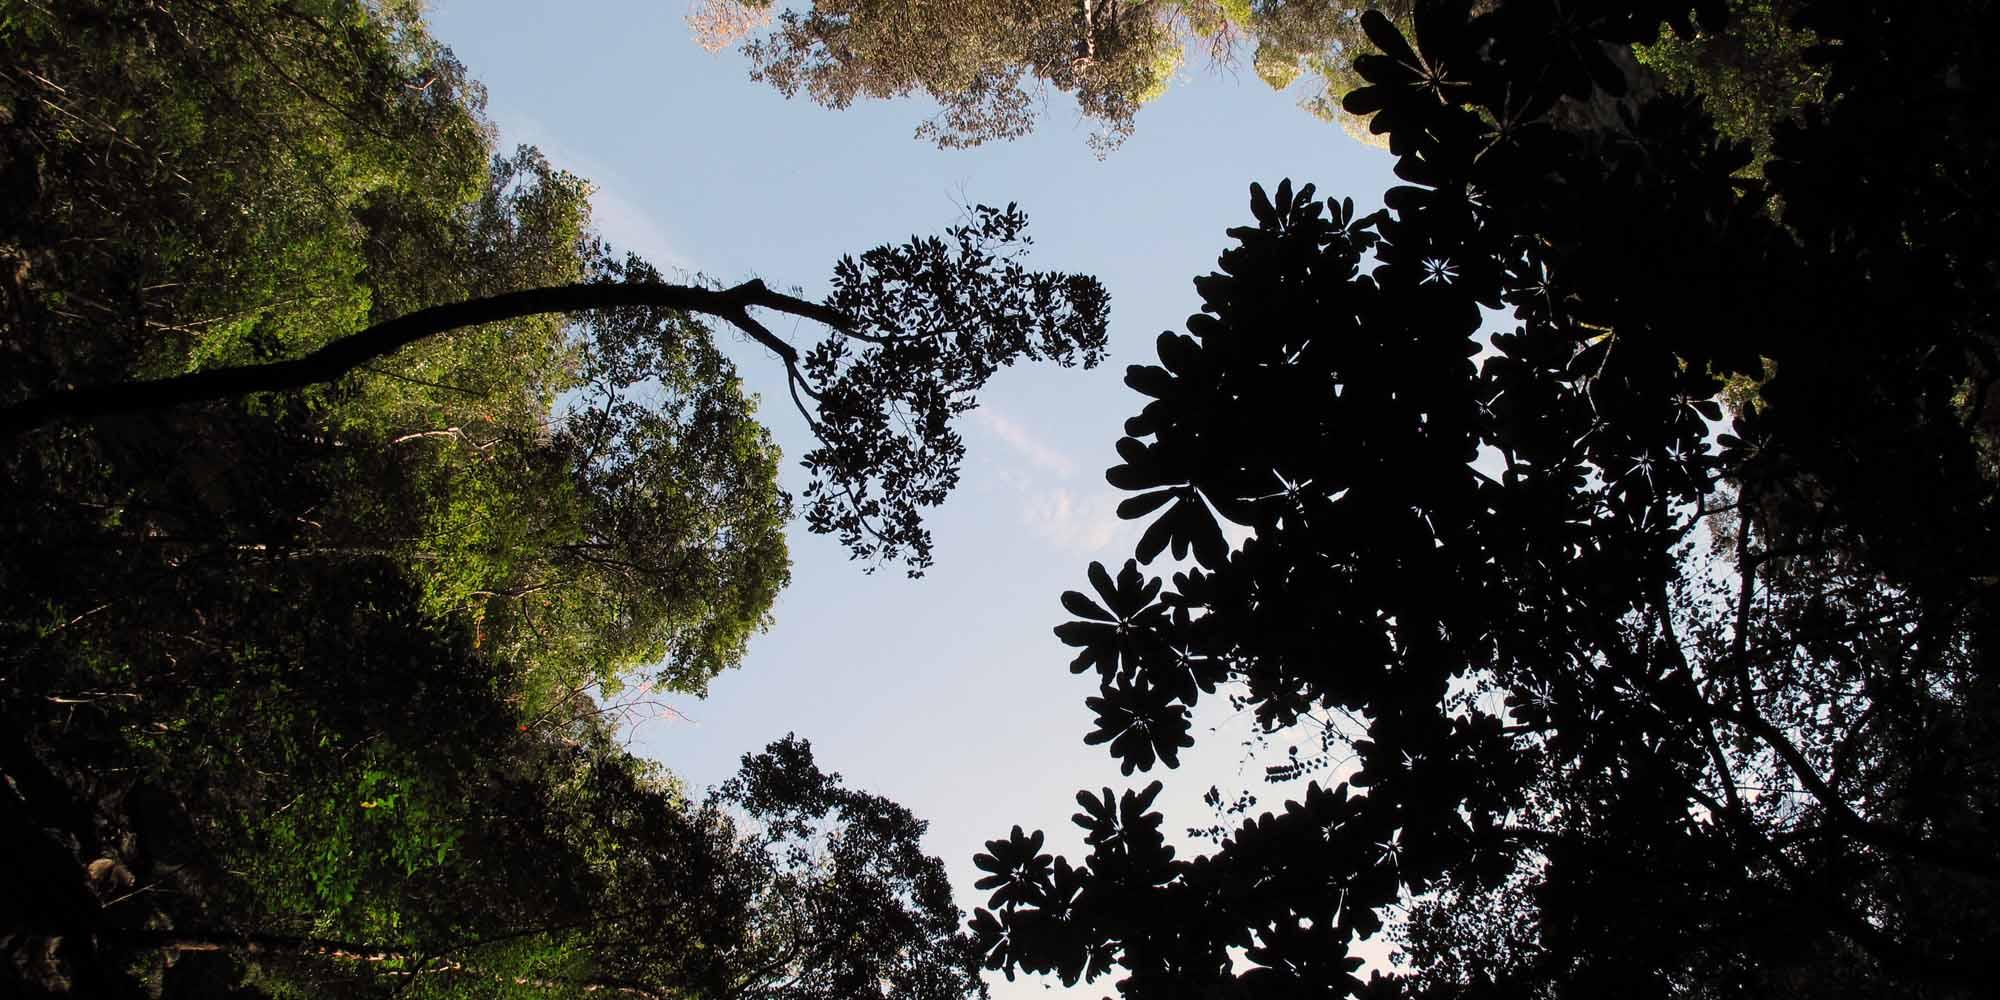 phuket-2010-trees.jpg